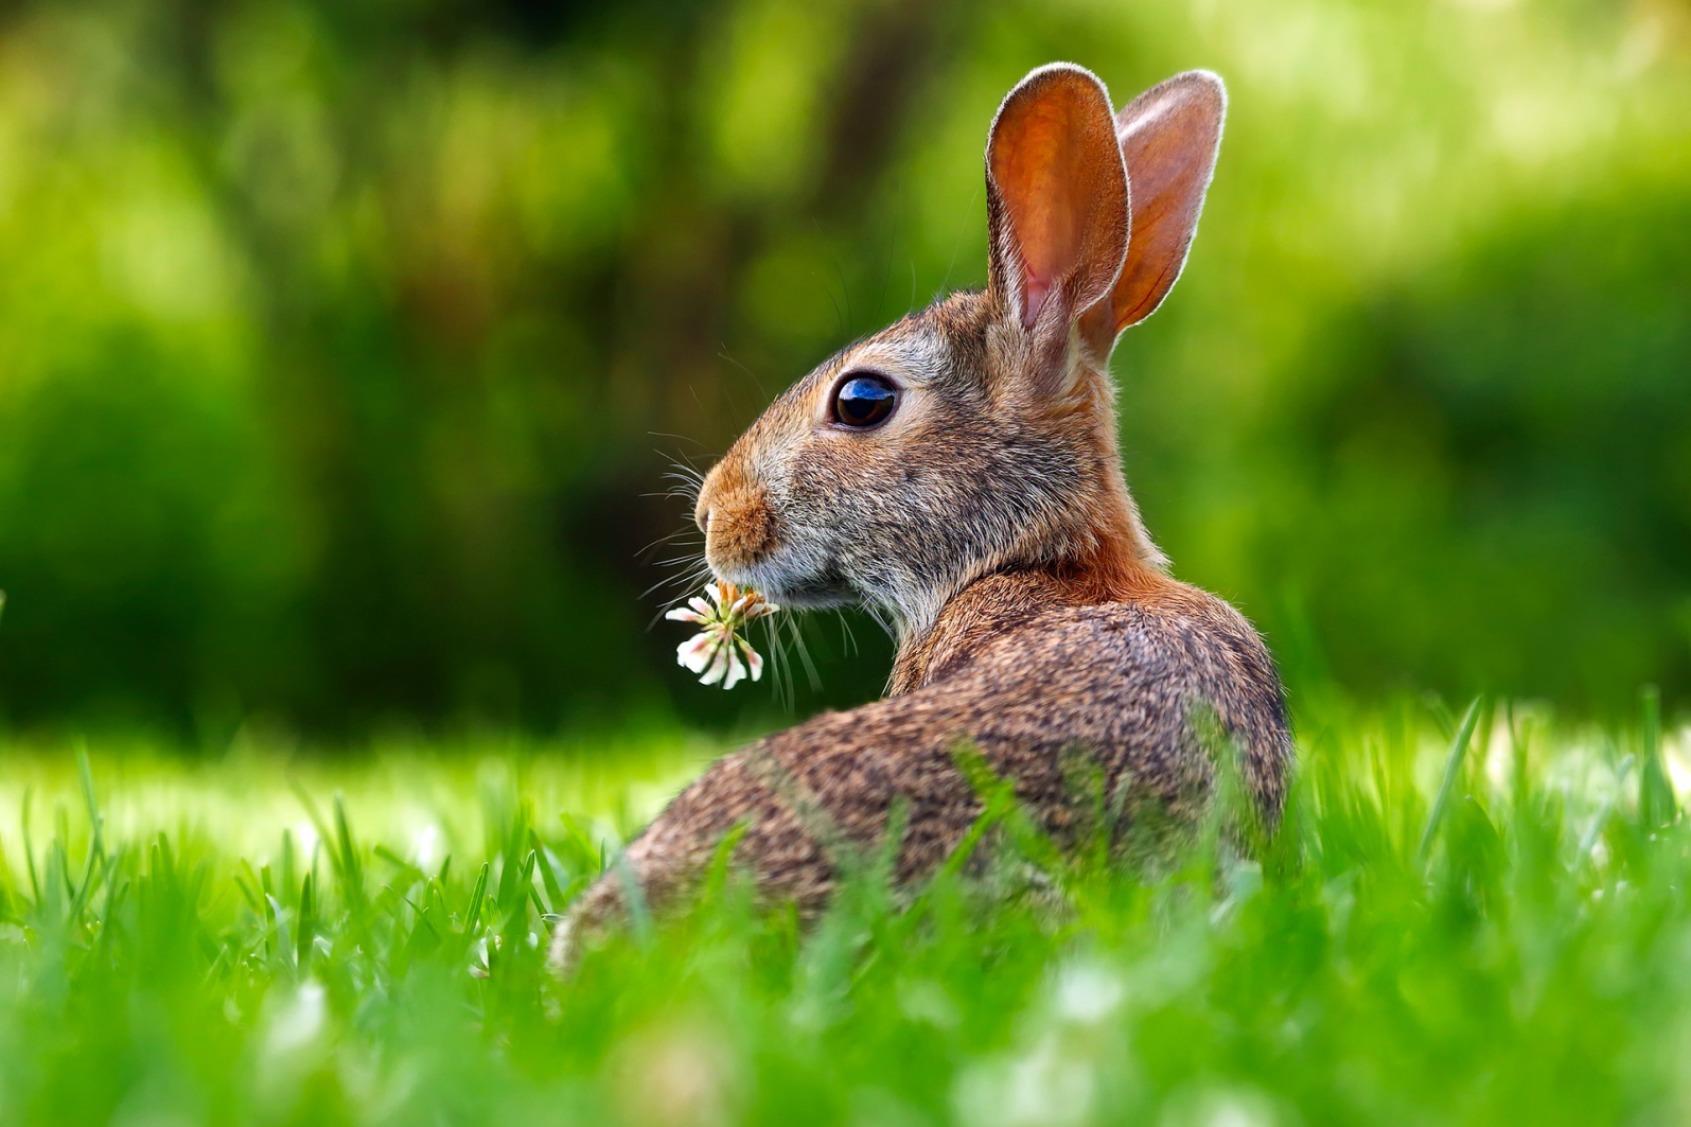 Bunny on Grass - Original image